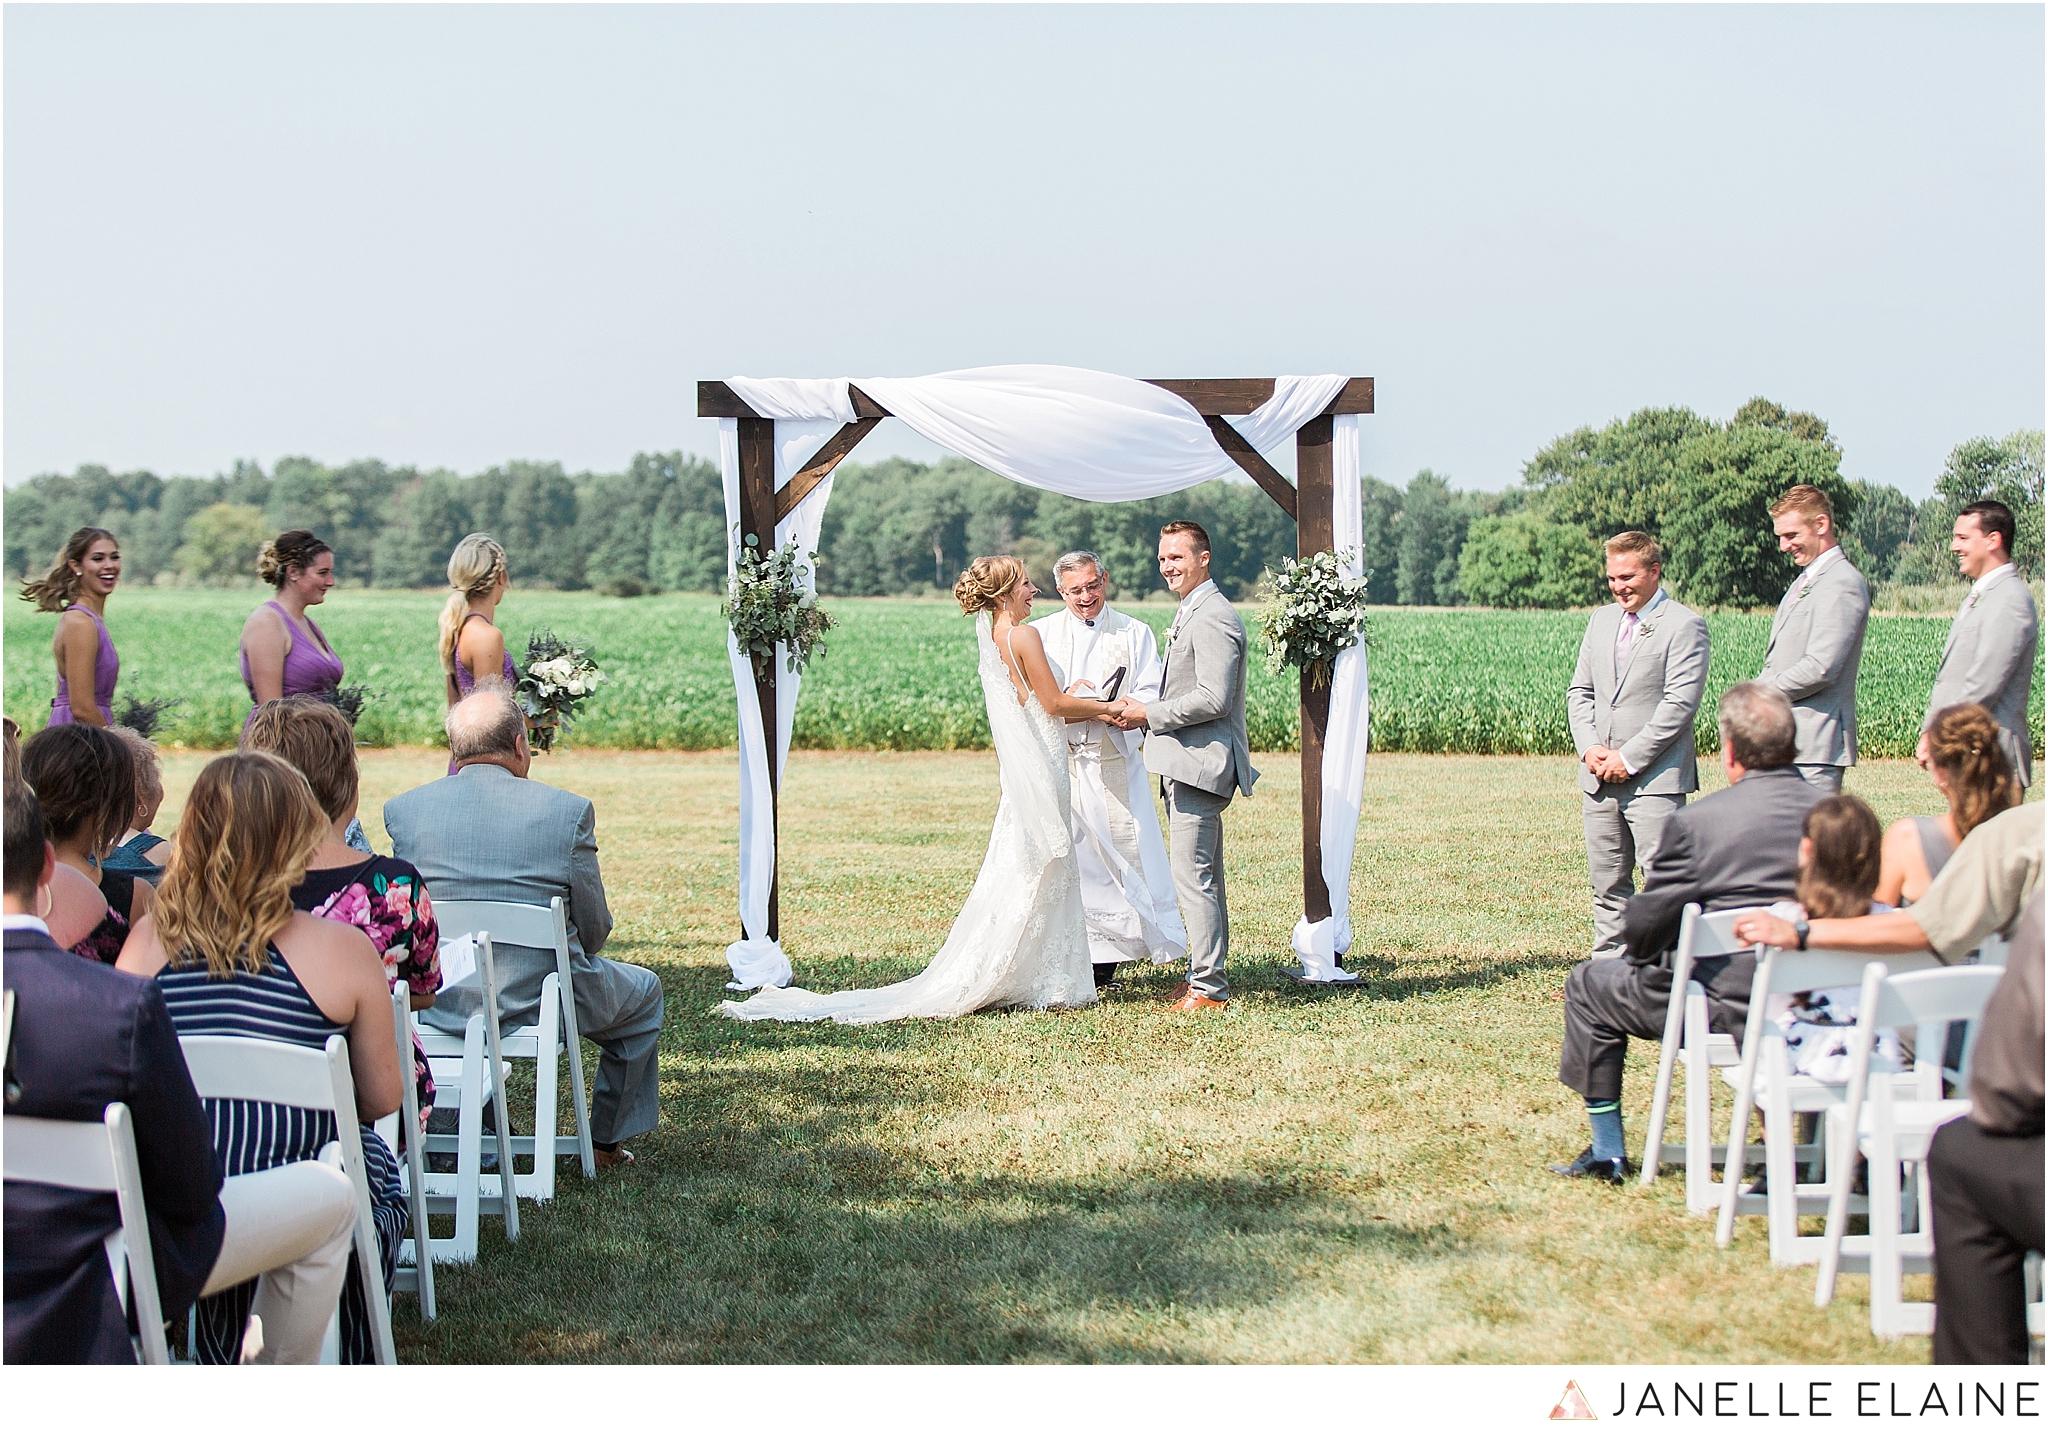 warnsholz-wedding-michigan-photography-janelle elaine photography-170.jpg